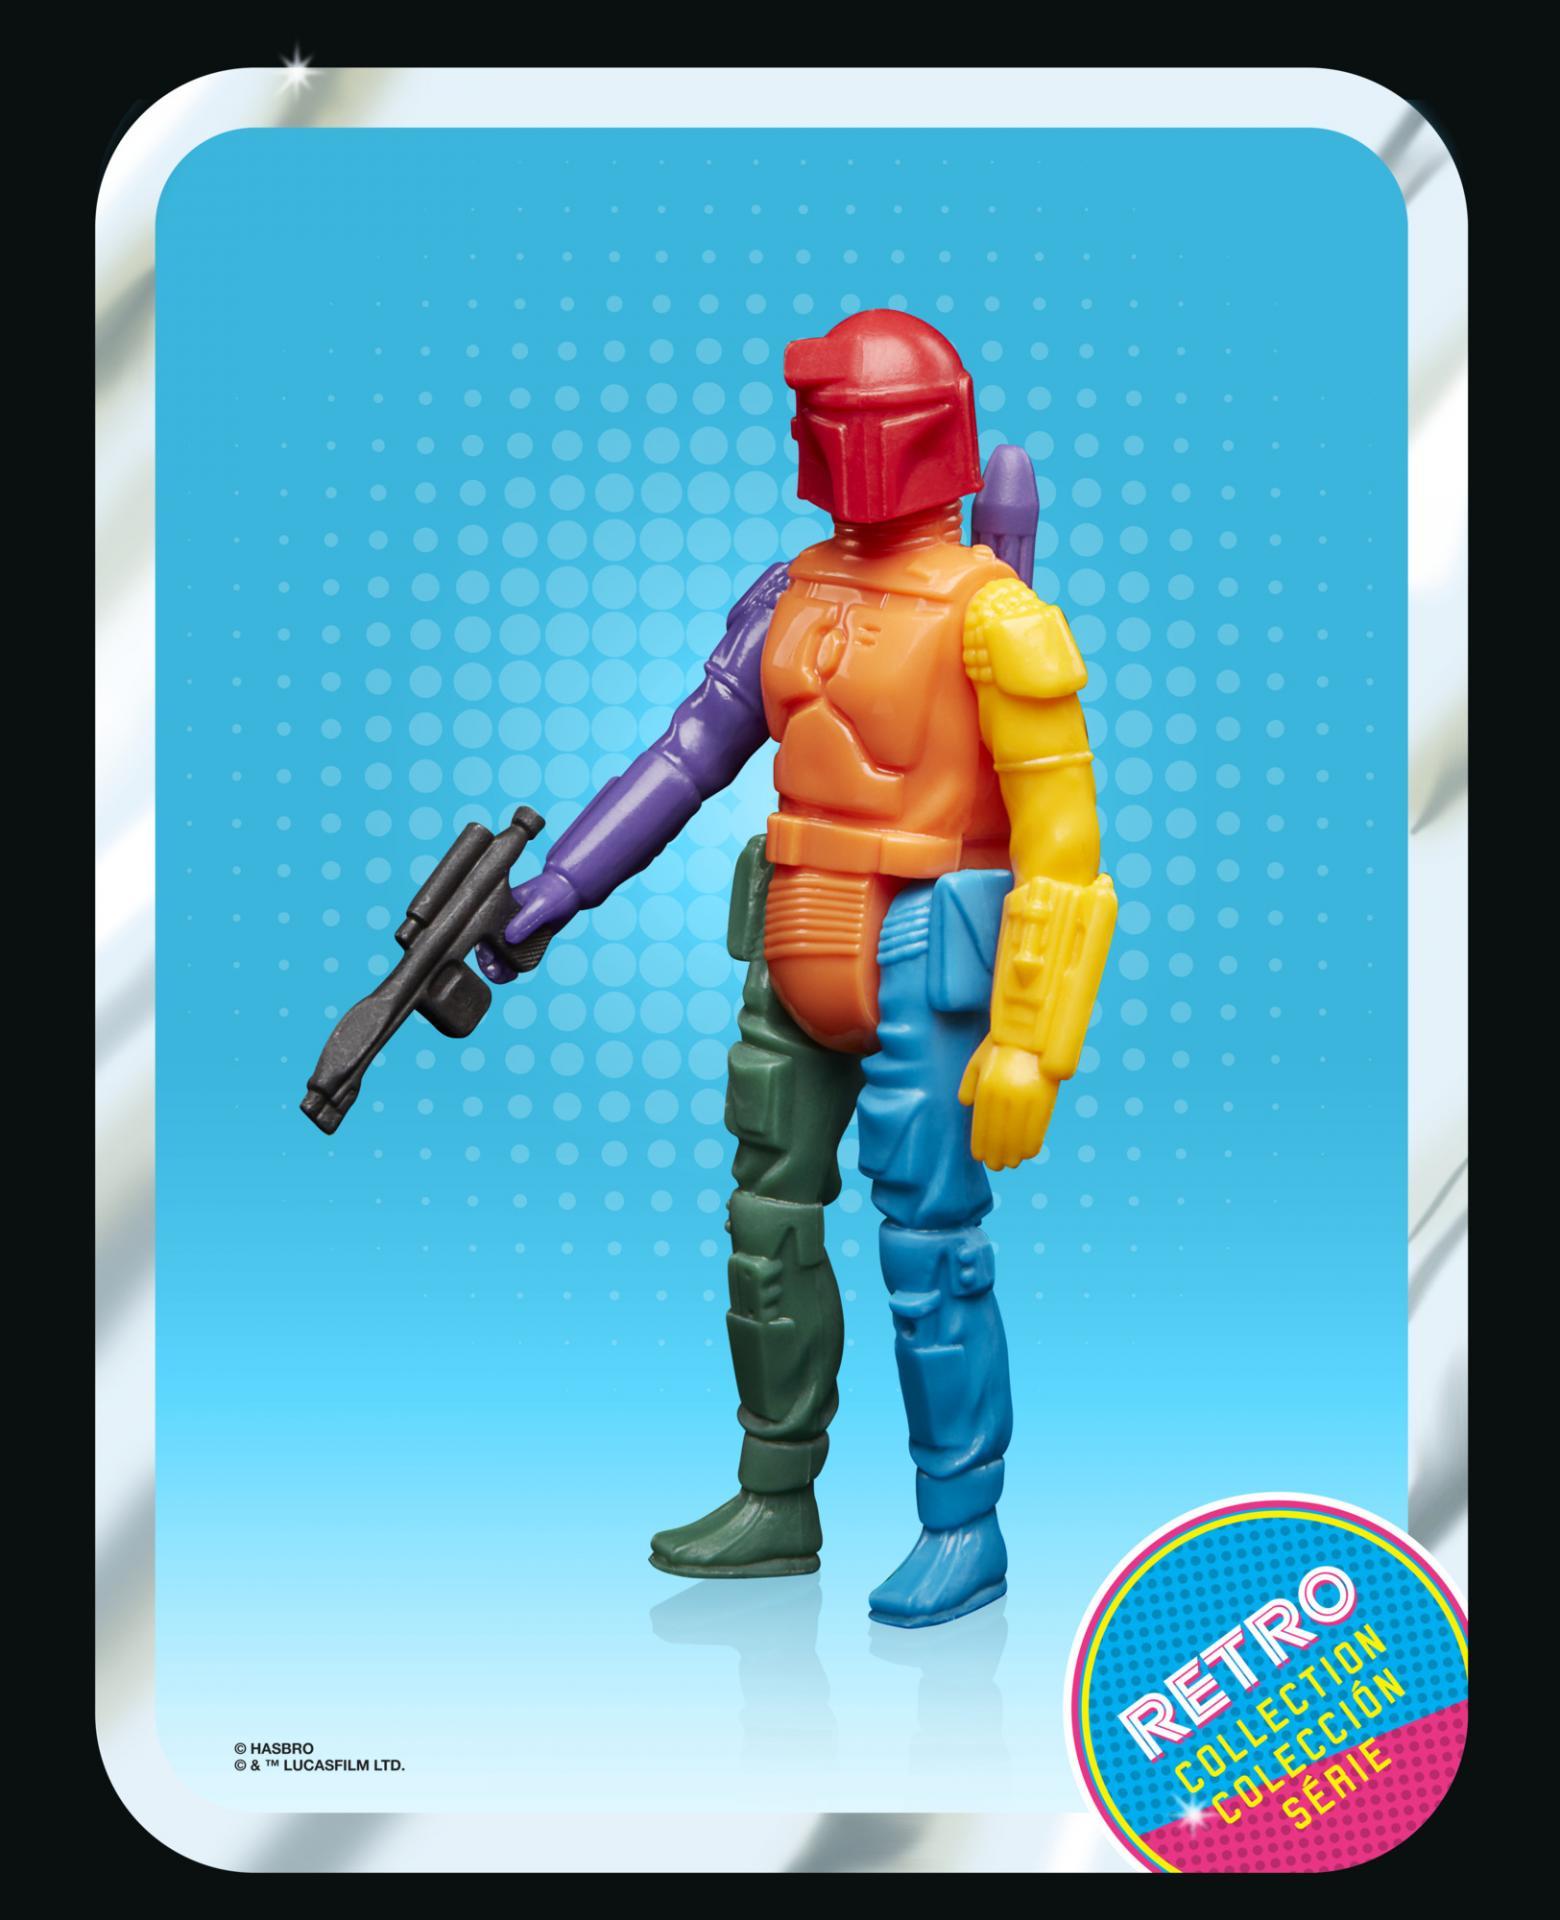 Star wars the retro collection boba fett prototype edition4